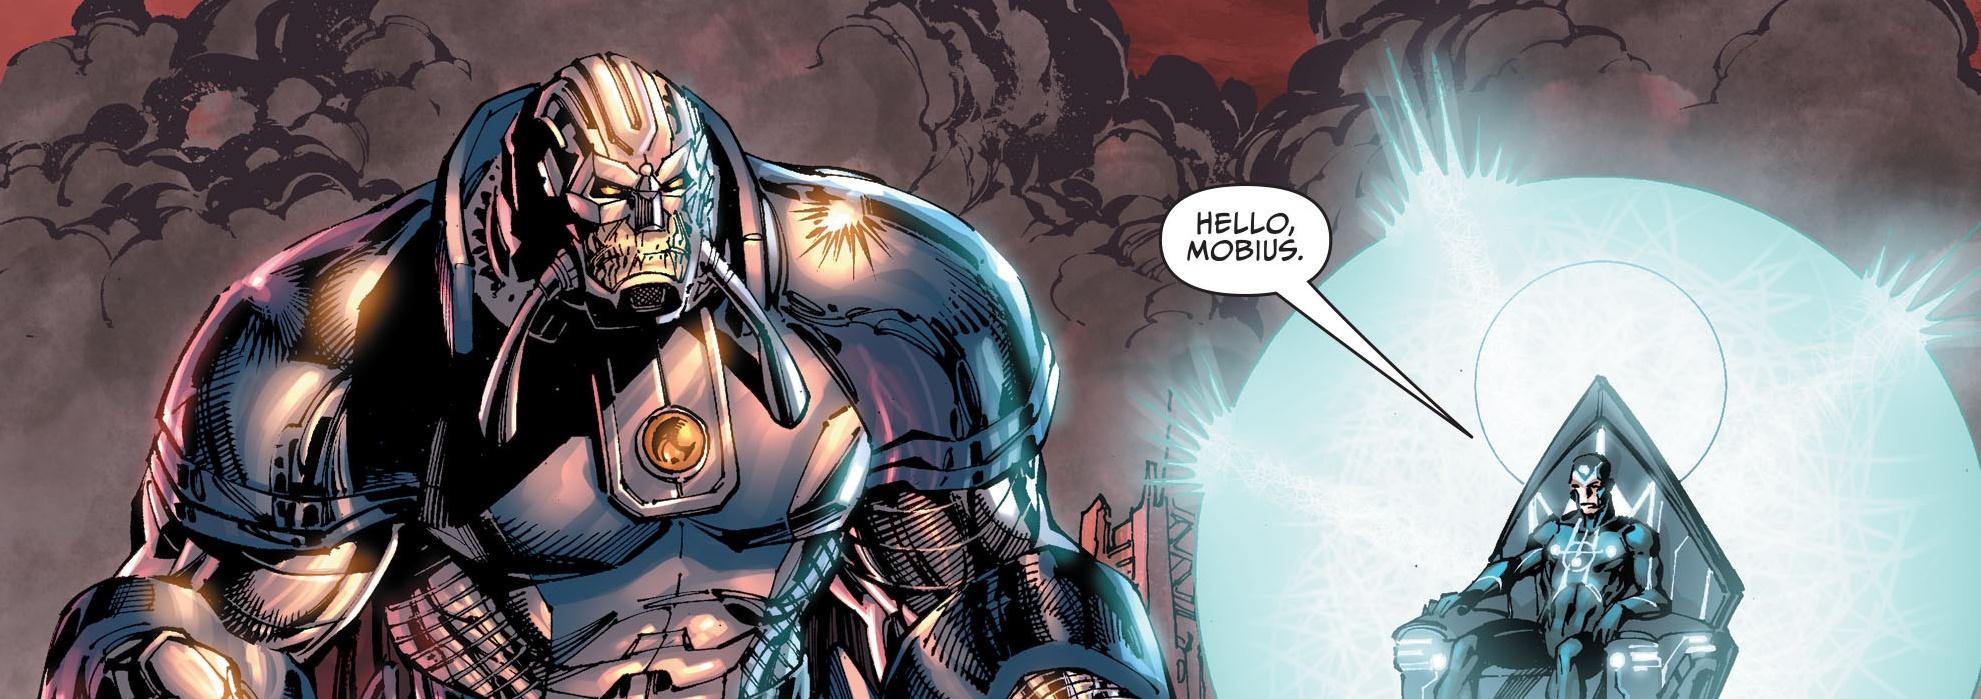 Justice League 40 thumb4